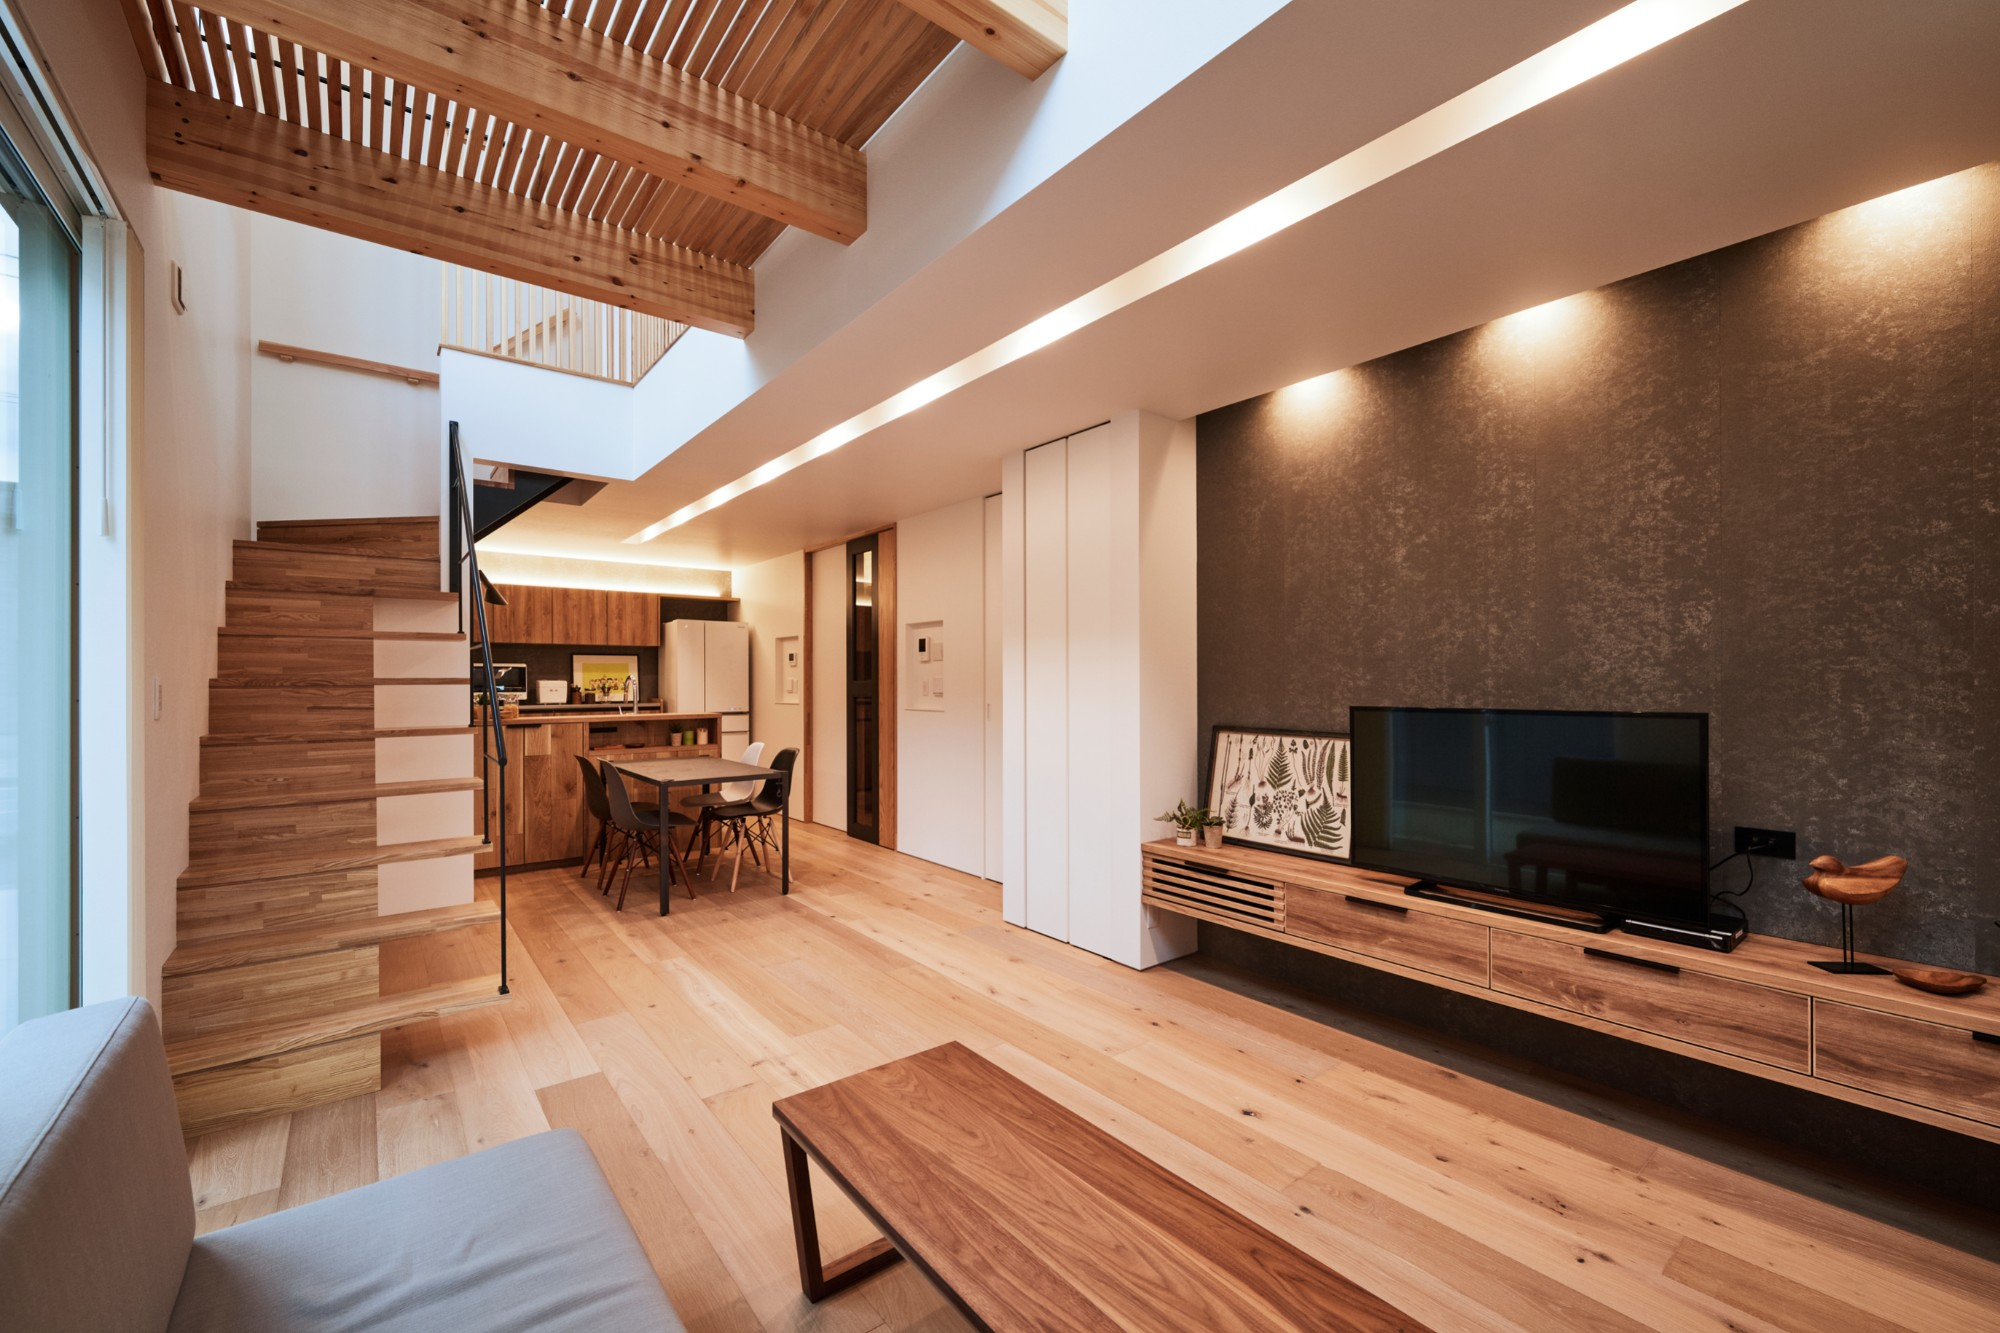 DETAIL HOME(ディテールホーム)「コンパクトにデザインする家」のシンプル・ナチュラルなリビング・ダイニングの実例写真